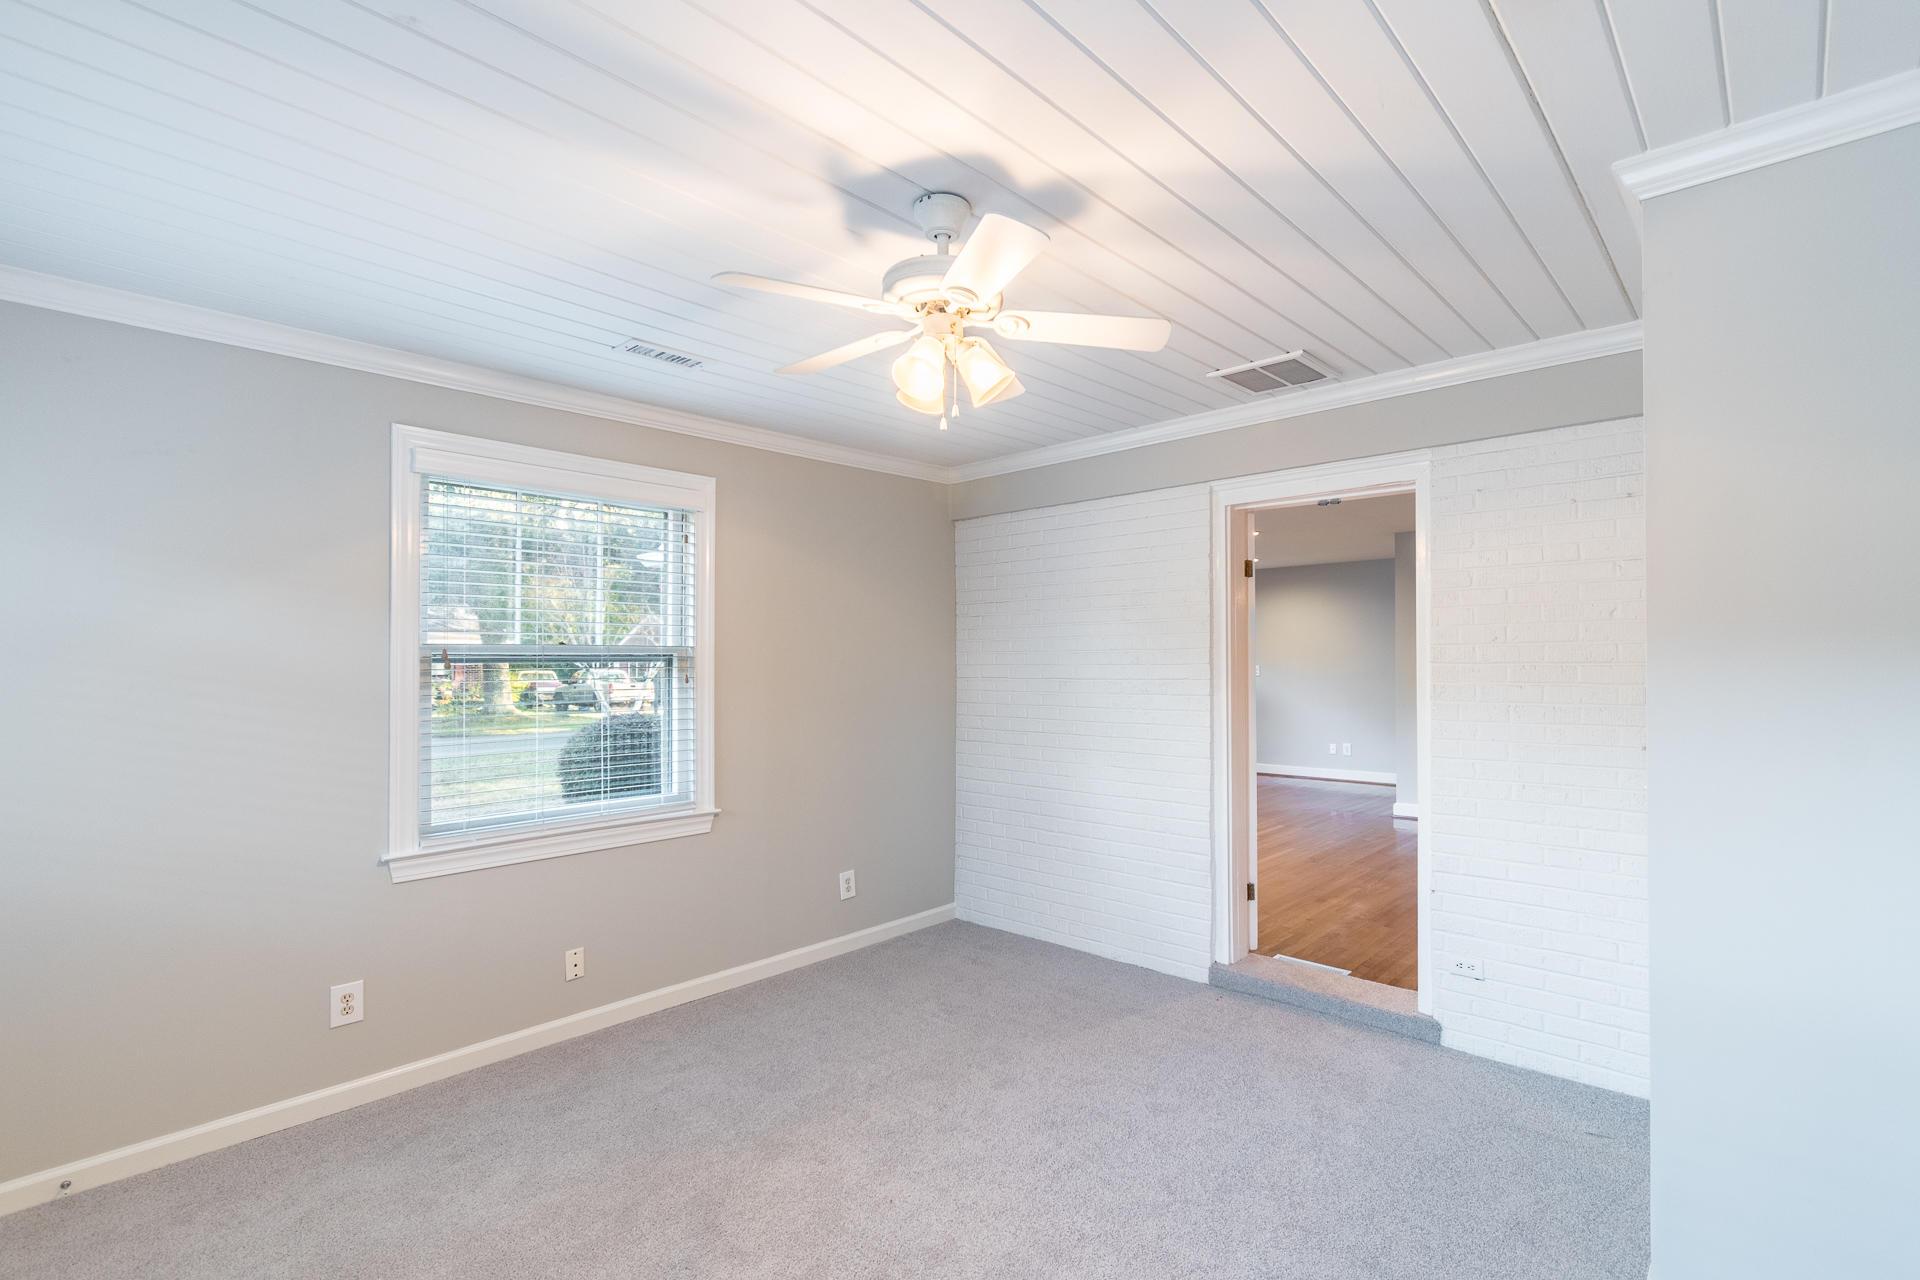 Edgewood Gardens Homes For Sale - 507 Risher, Charleston, SC - 10